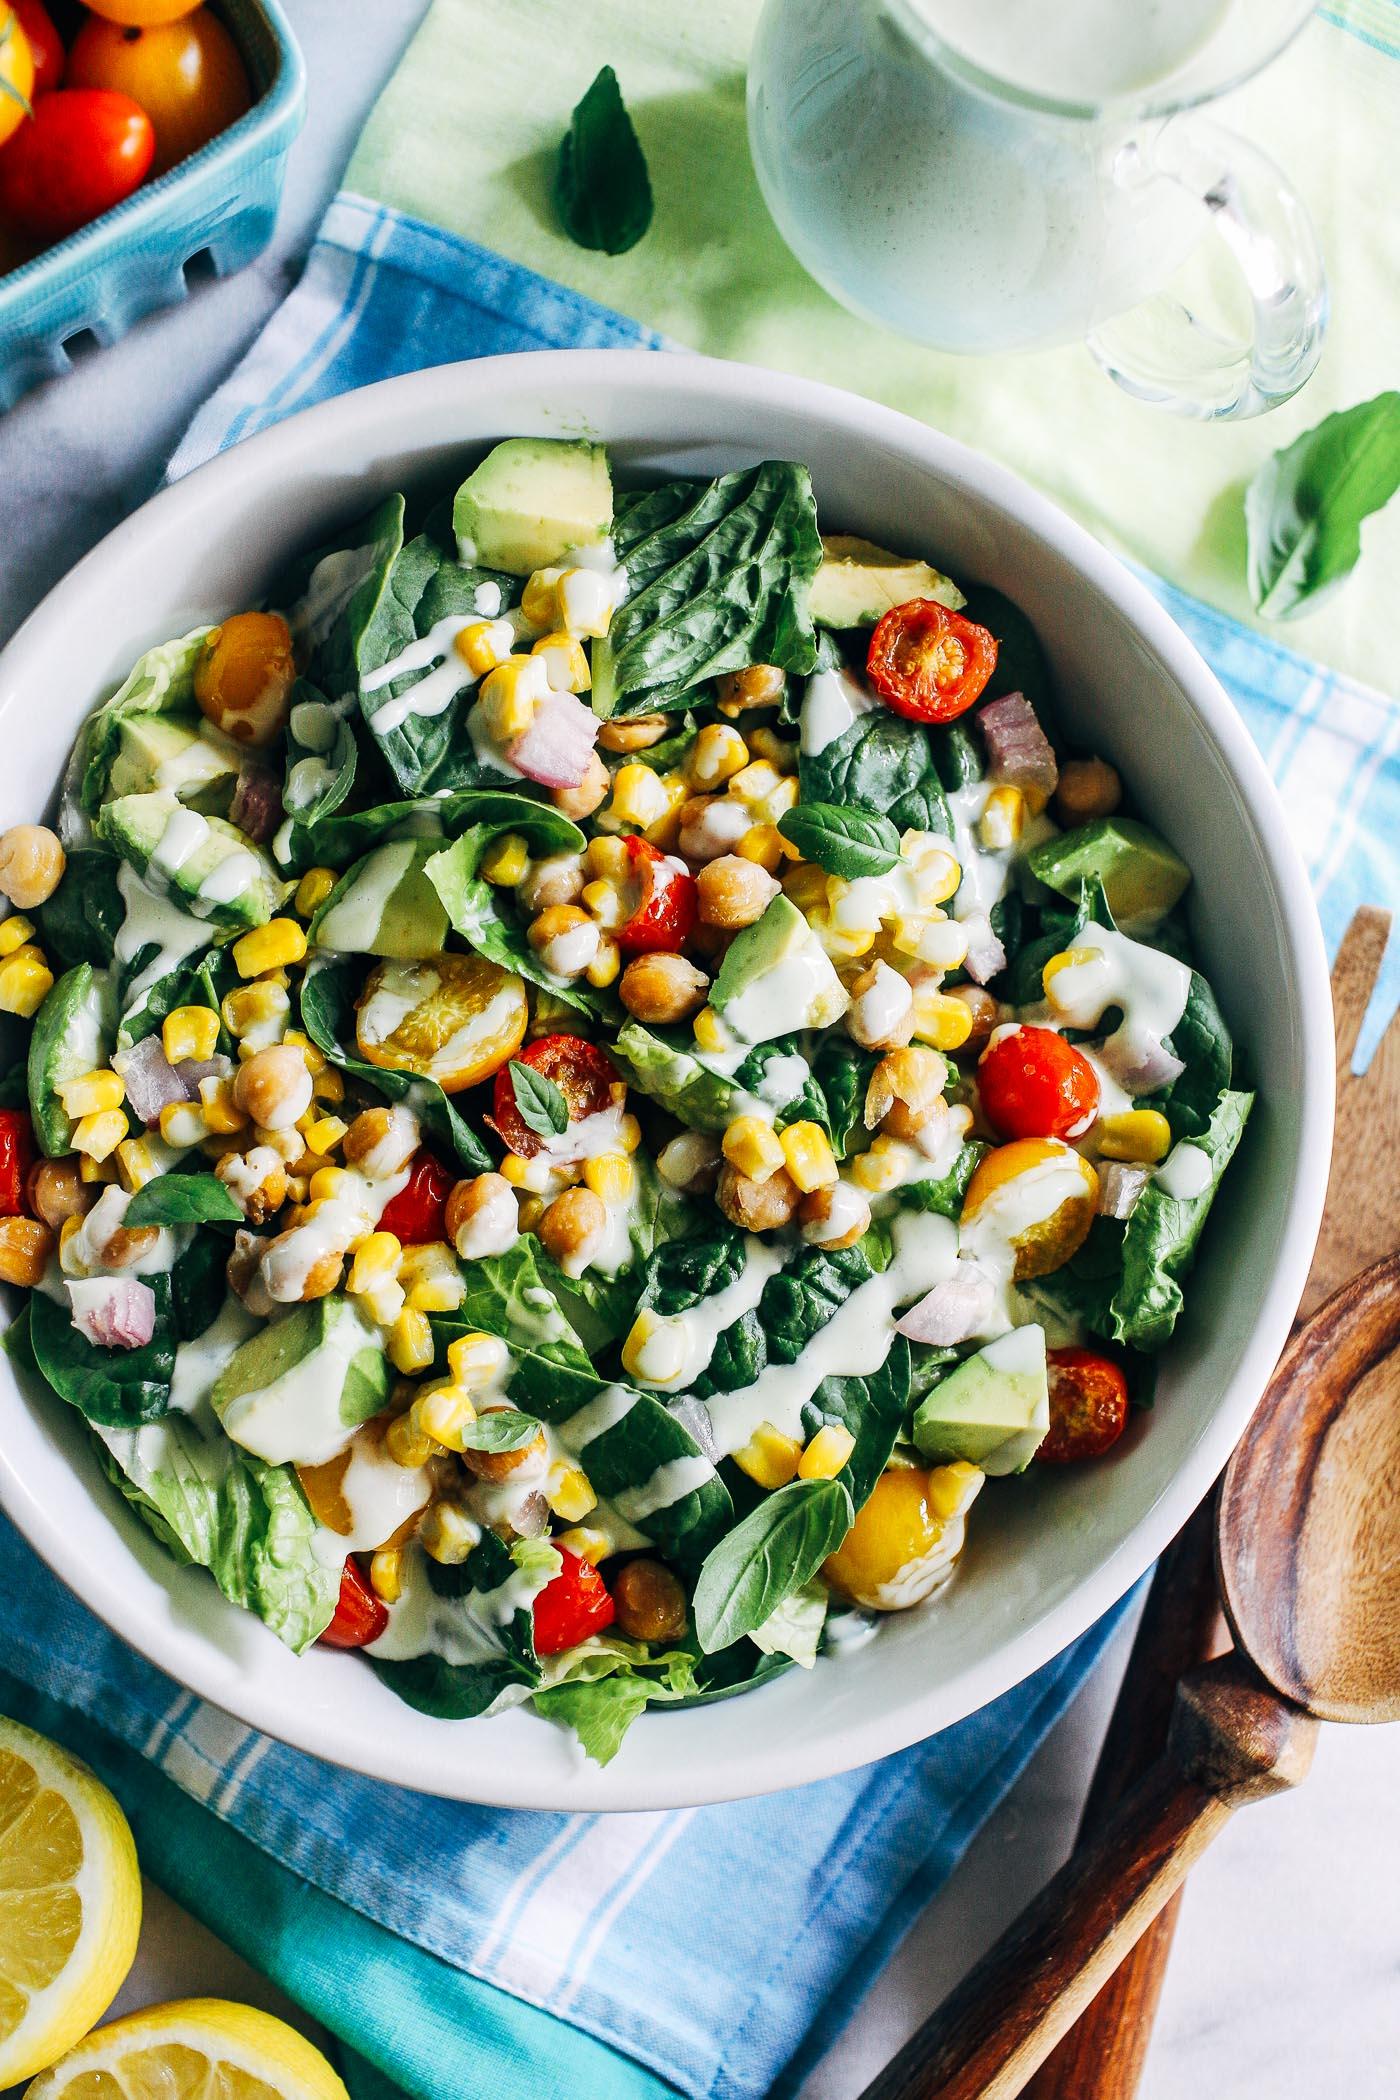 Best Summer Street Style: Roasted Corn Tomato Summer Salad With Lemon-Basil Yogurt